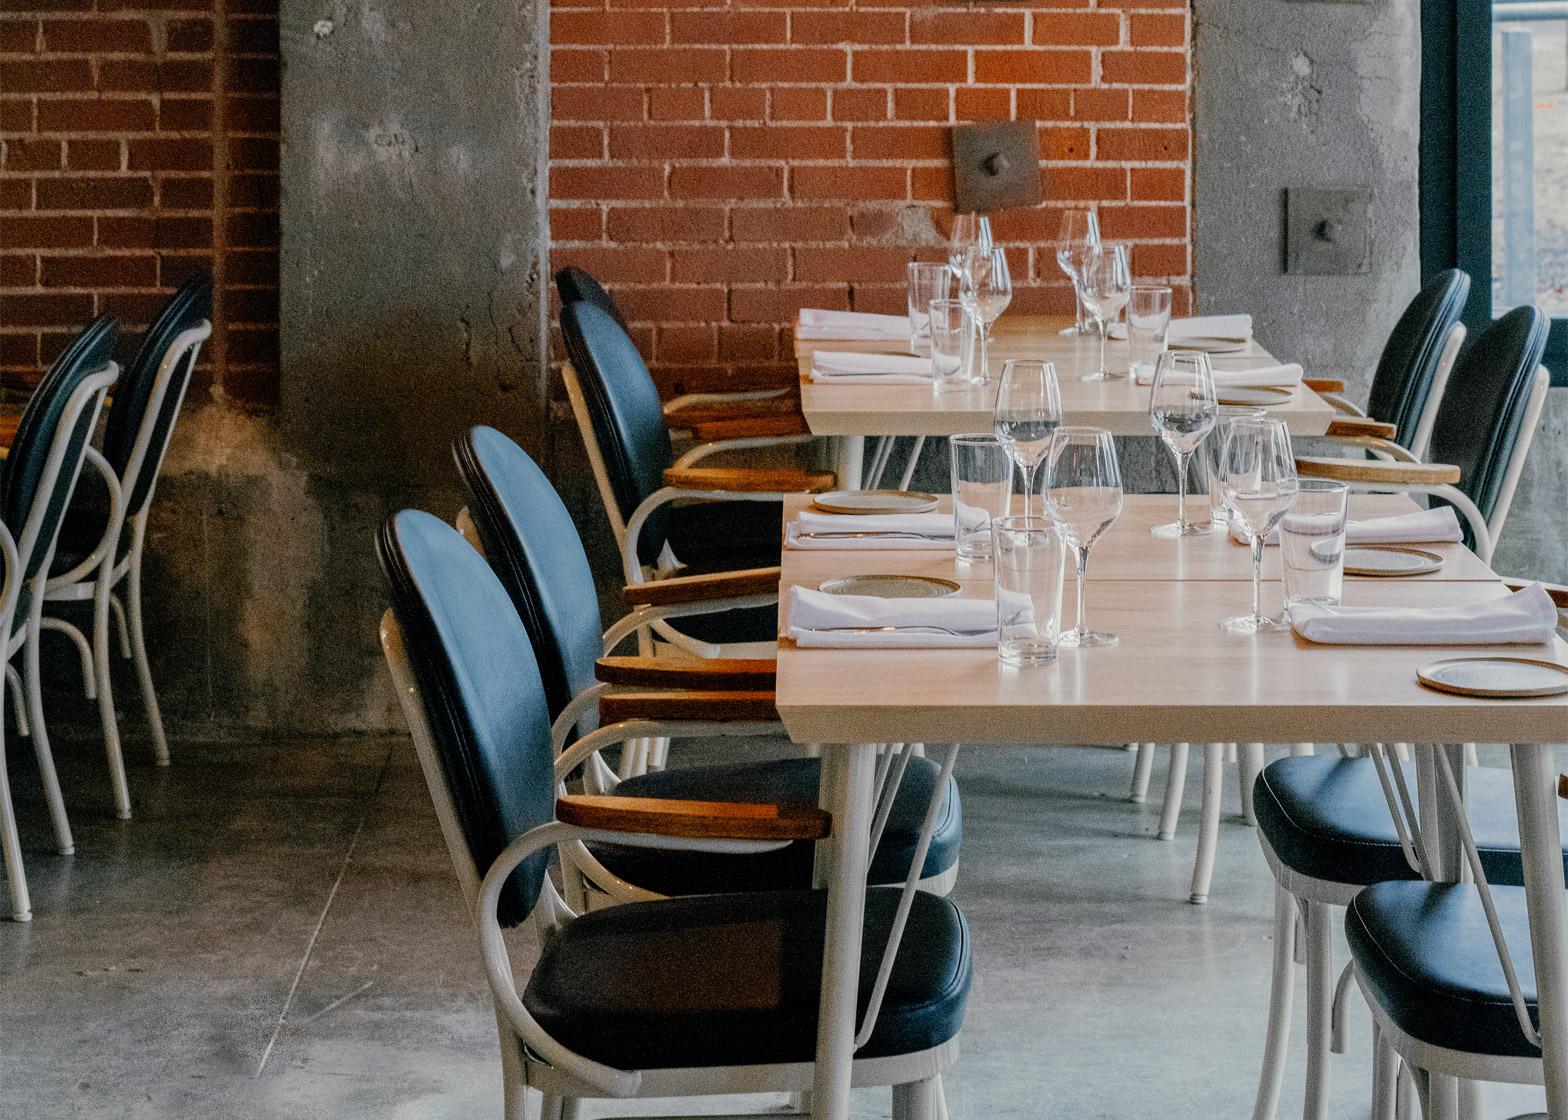 05-restaurante-montreal-antiga-fabrica-transformacao